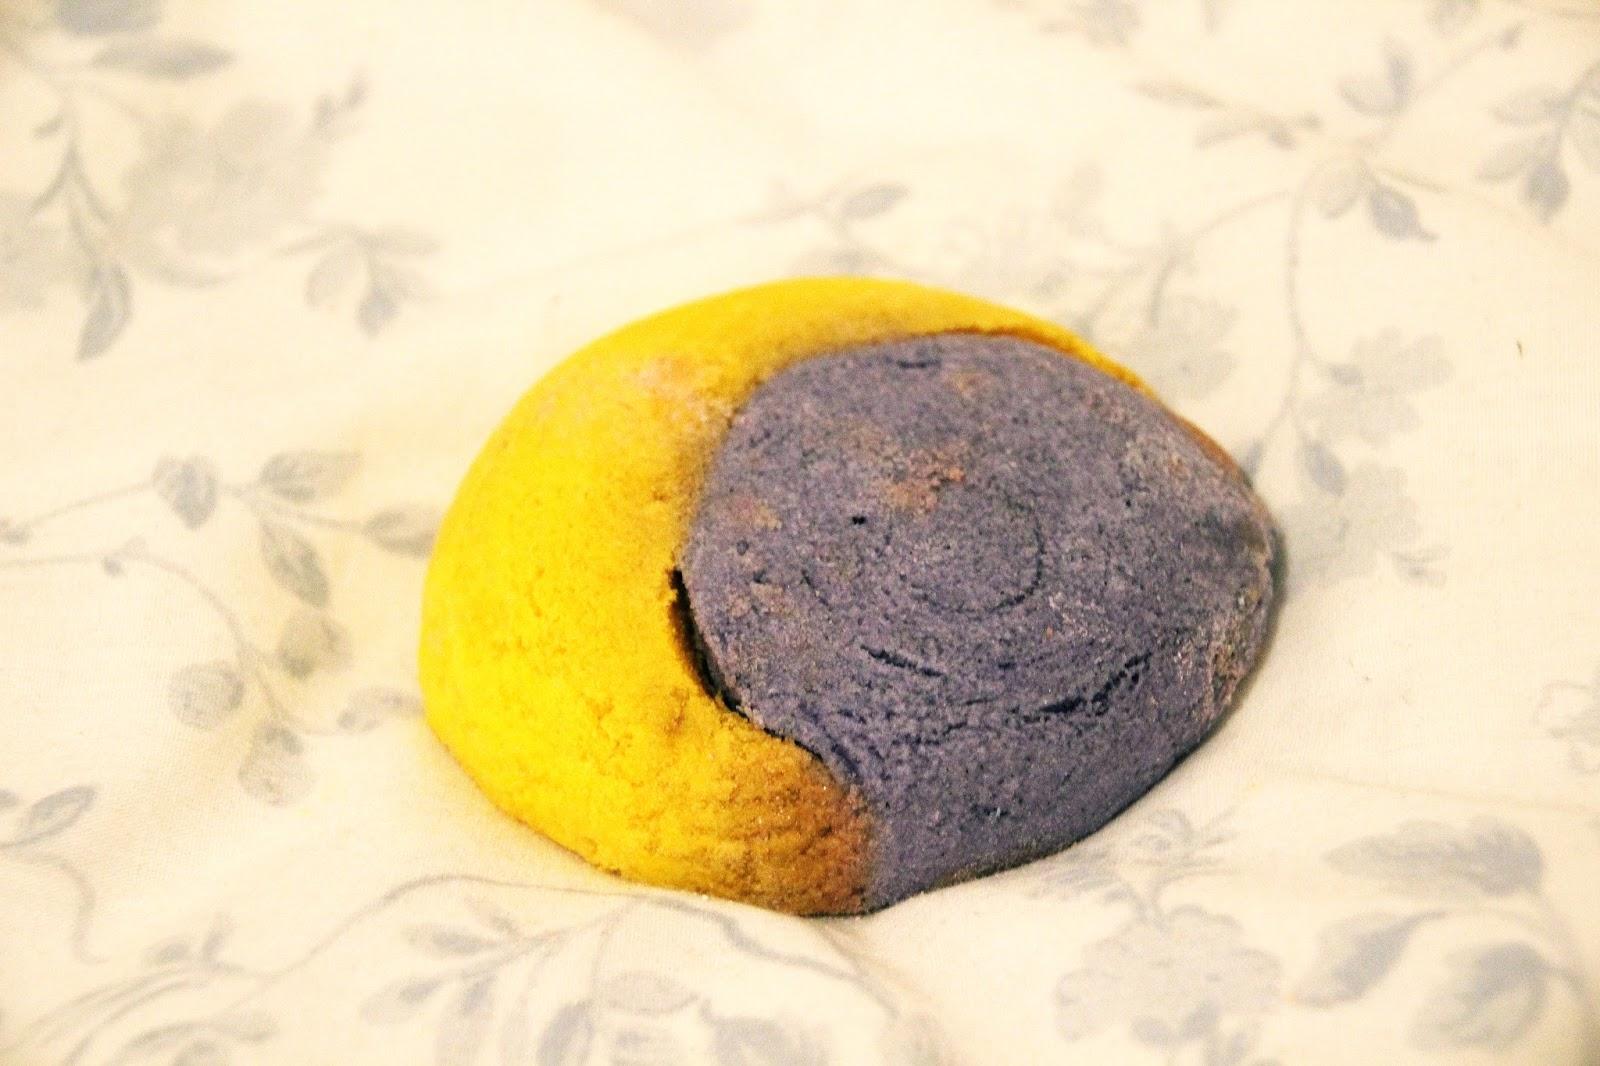 Christmas Bath Bombs Lush.Lush Bath Bomb Christmas Eve Moonlight Soak Review